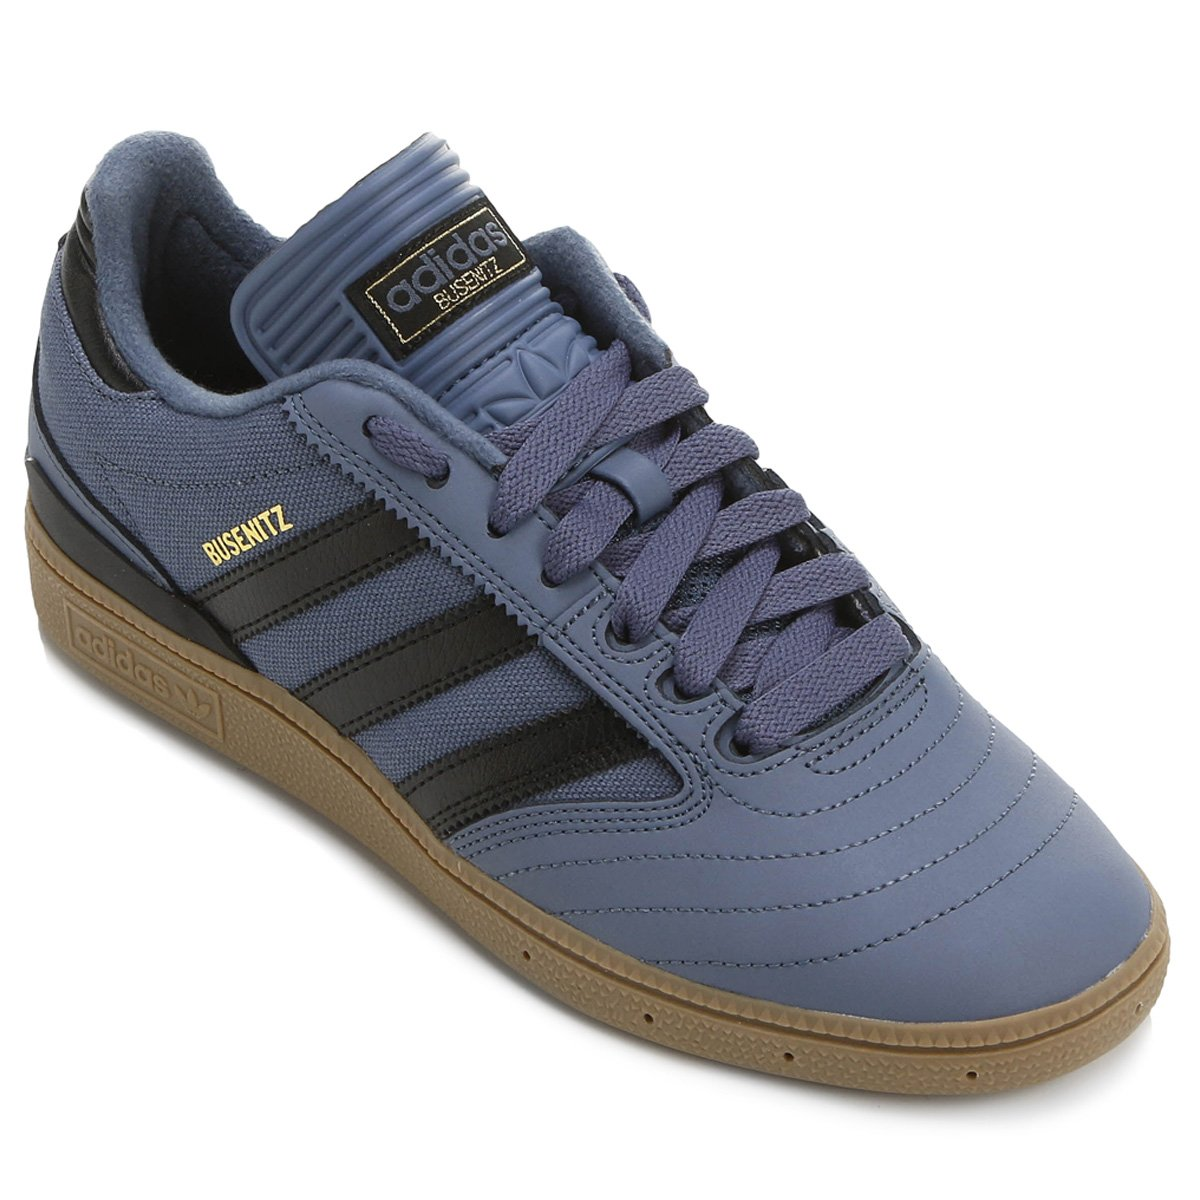 Tênis Adidas Busenitz - Compre Agora  4fab4d130f9b4